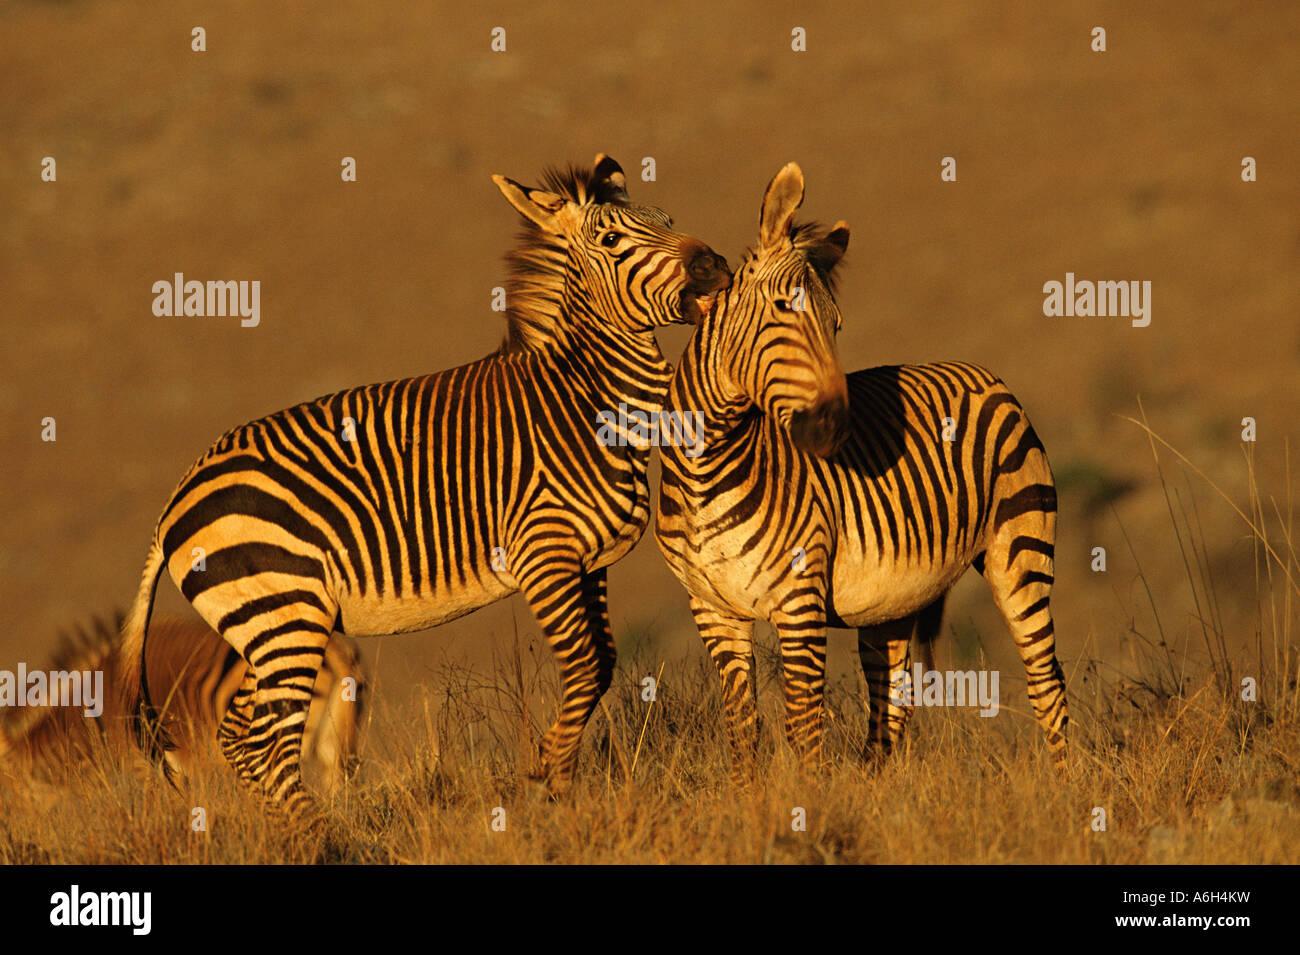 Hartmanns mountain zebra - Stock Image